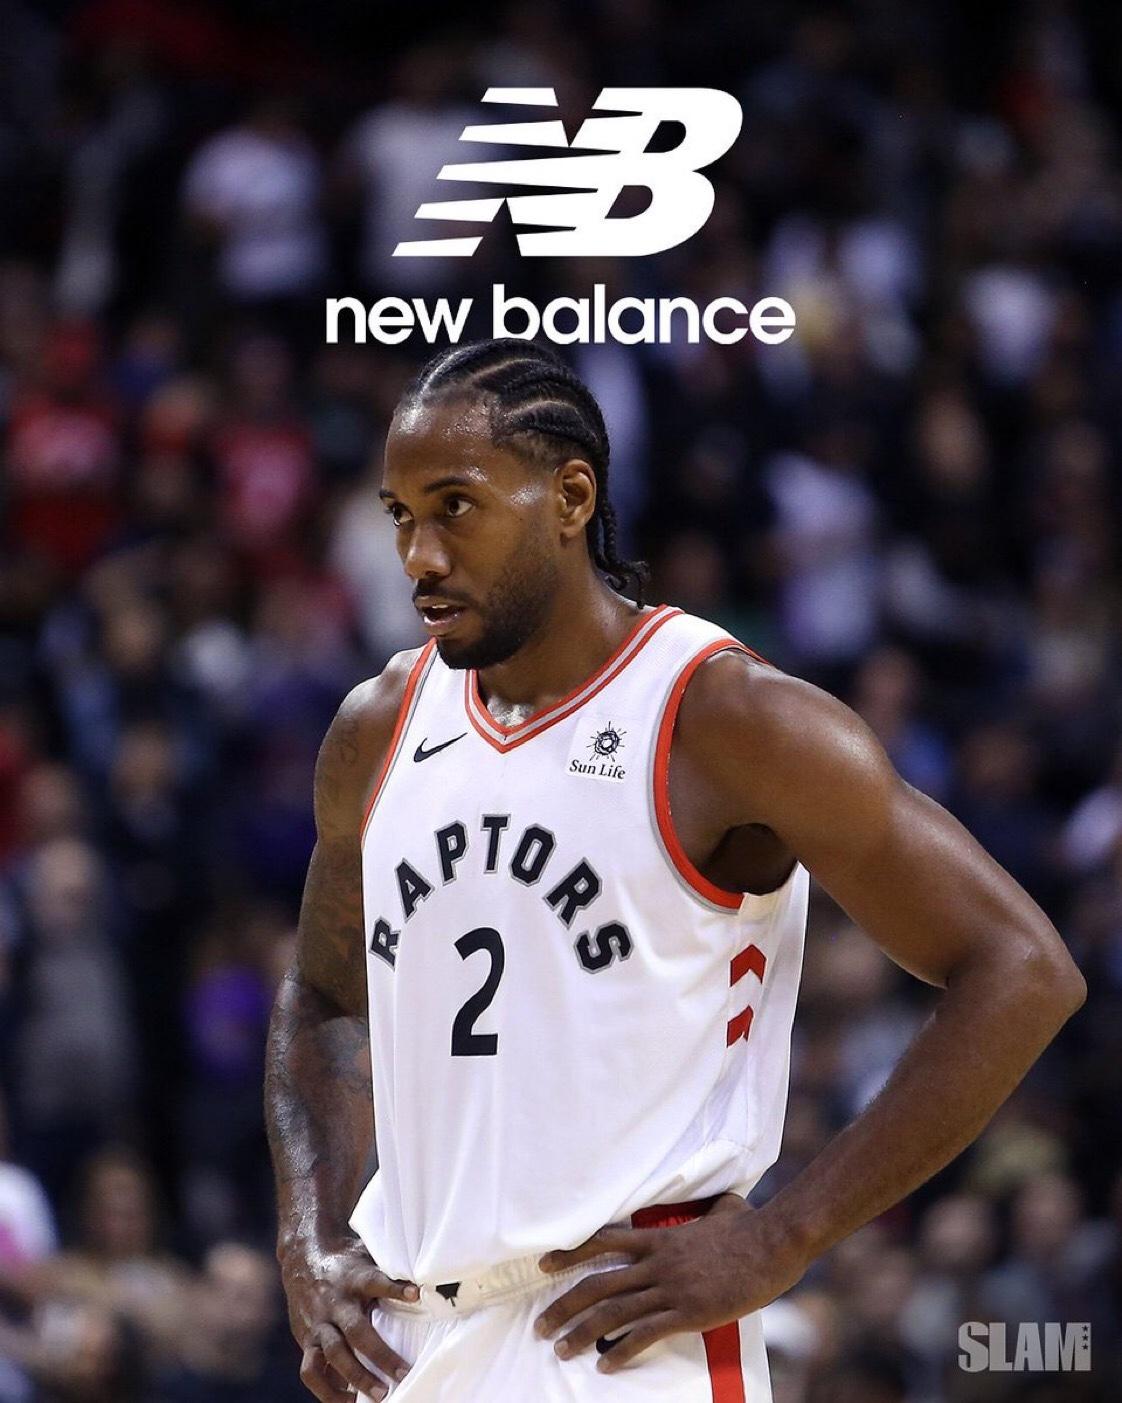 zapatillas new balance basketball